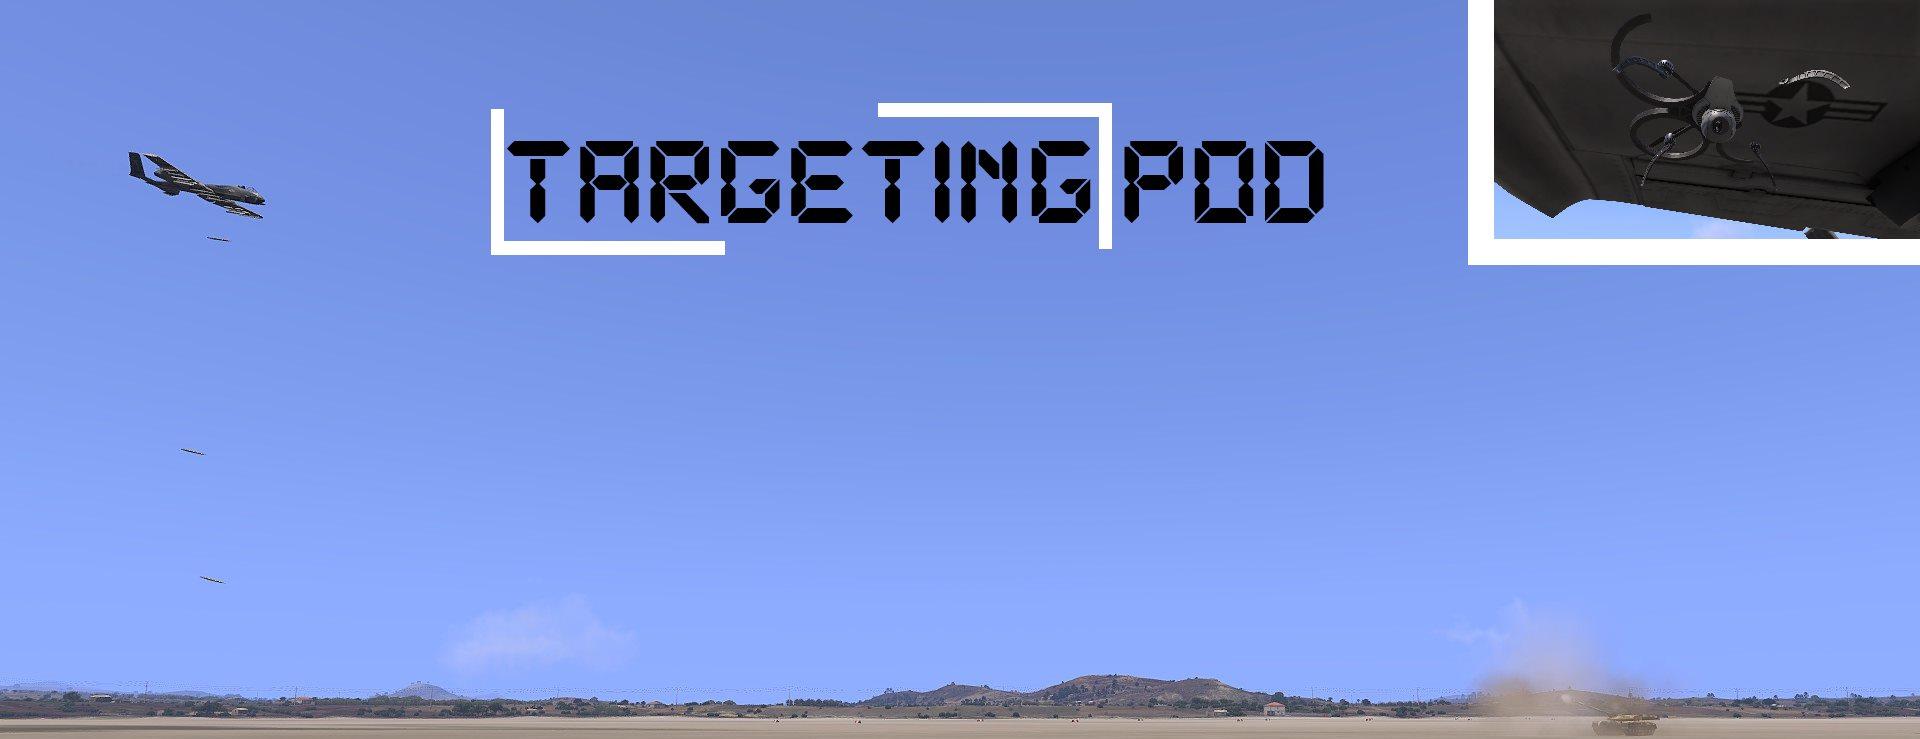 targetingpod.jpg